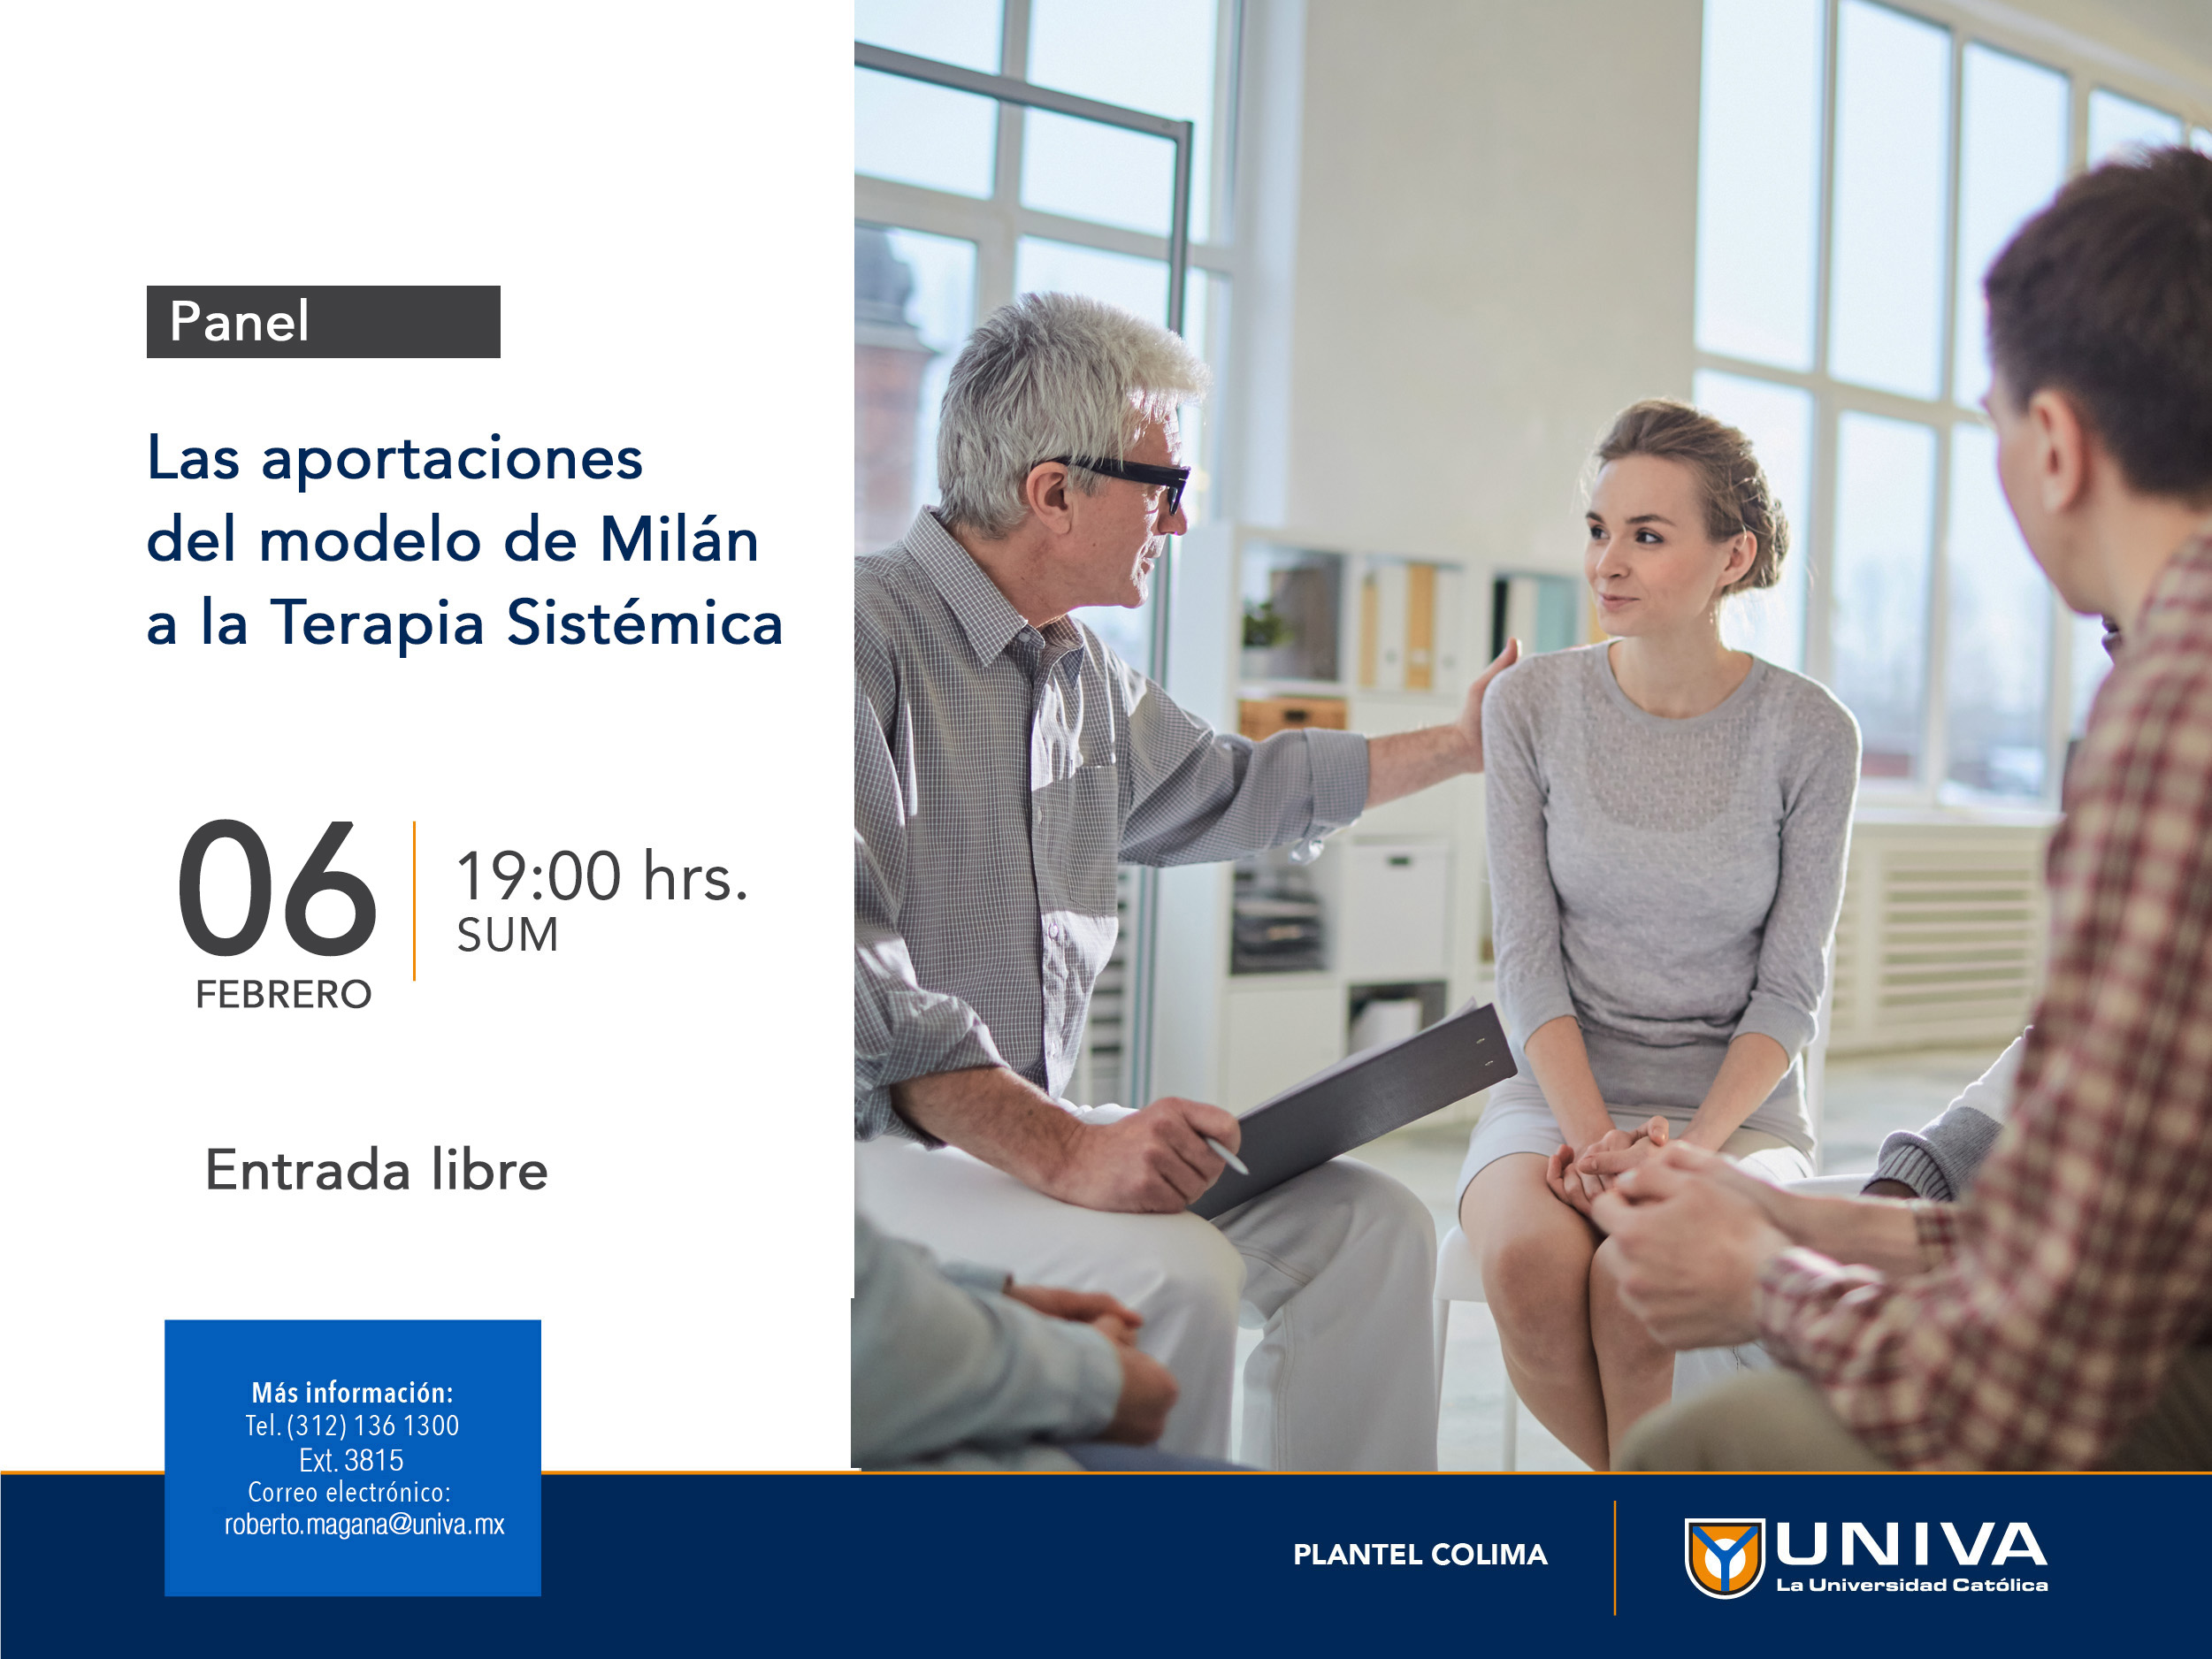 Panel: Las aportaciones del modelo de Milán a la Terapia Sistémica.